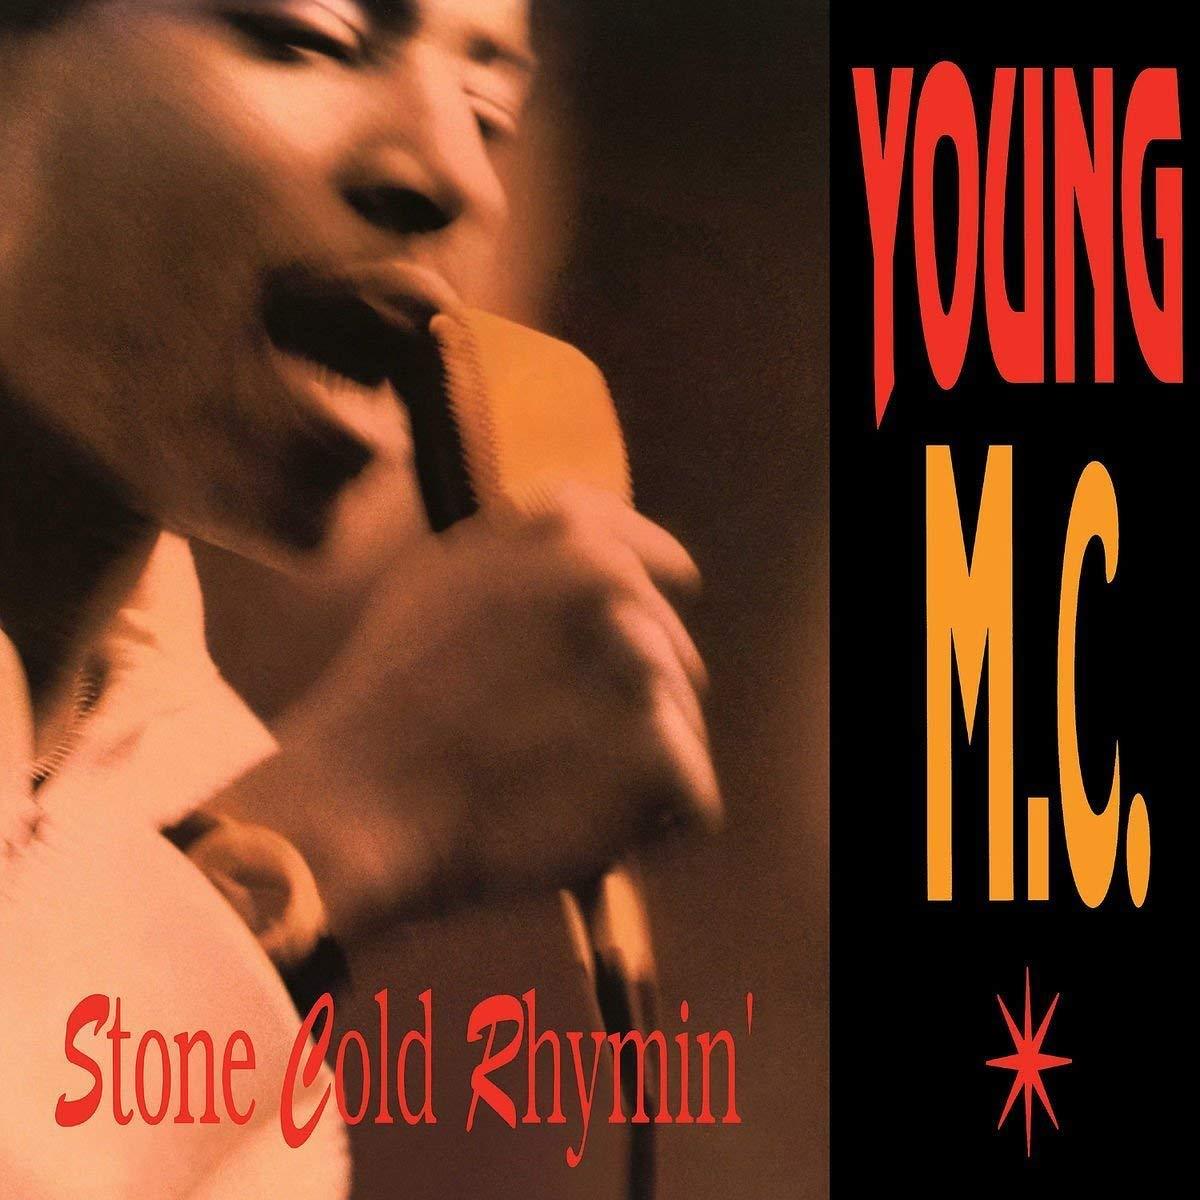 Young MC Young MC. Stone Cold Rhymin' (LP) dj lbr mc shurakano dj lbr feat mc shurakano u got it maxi single lp